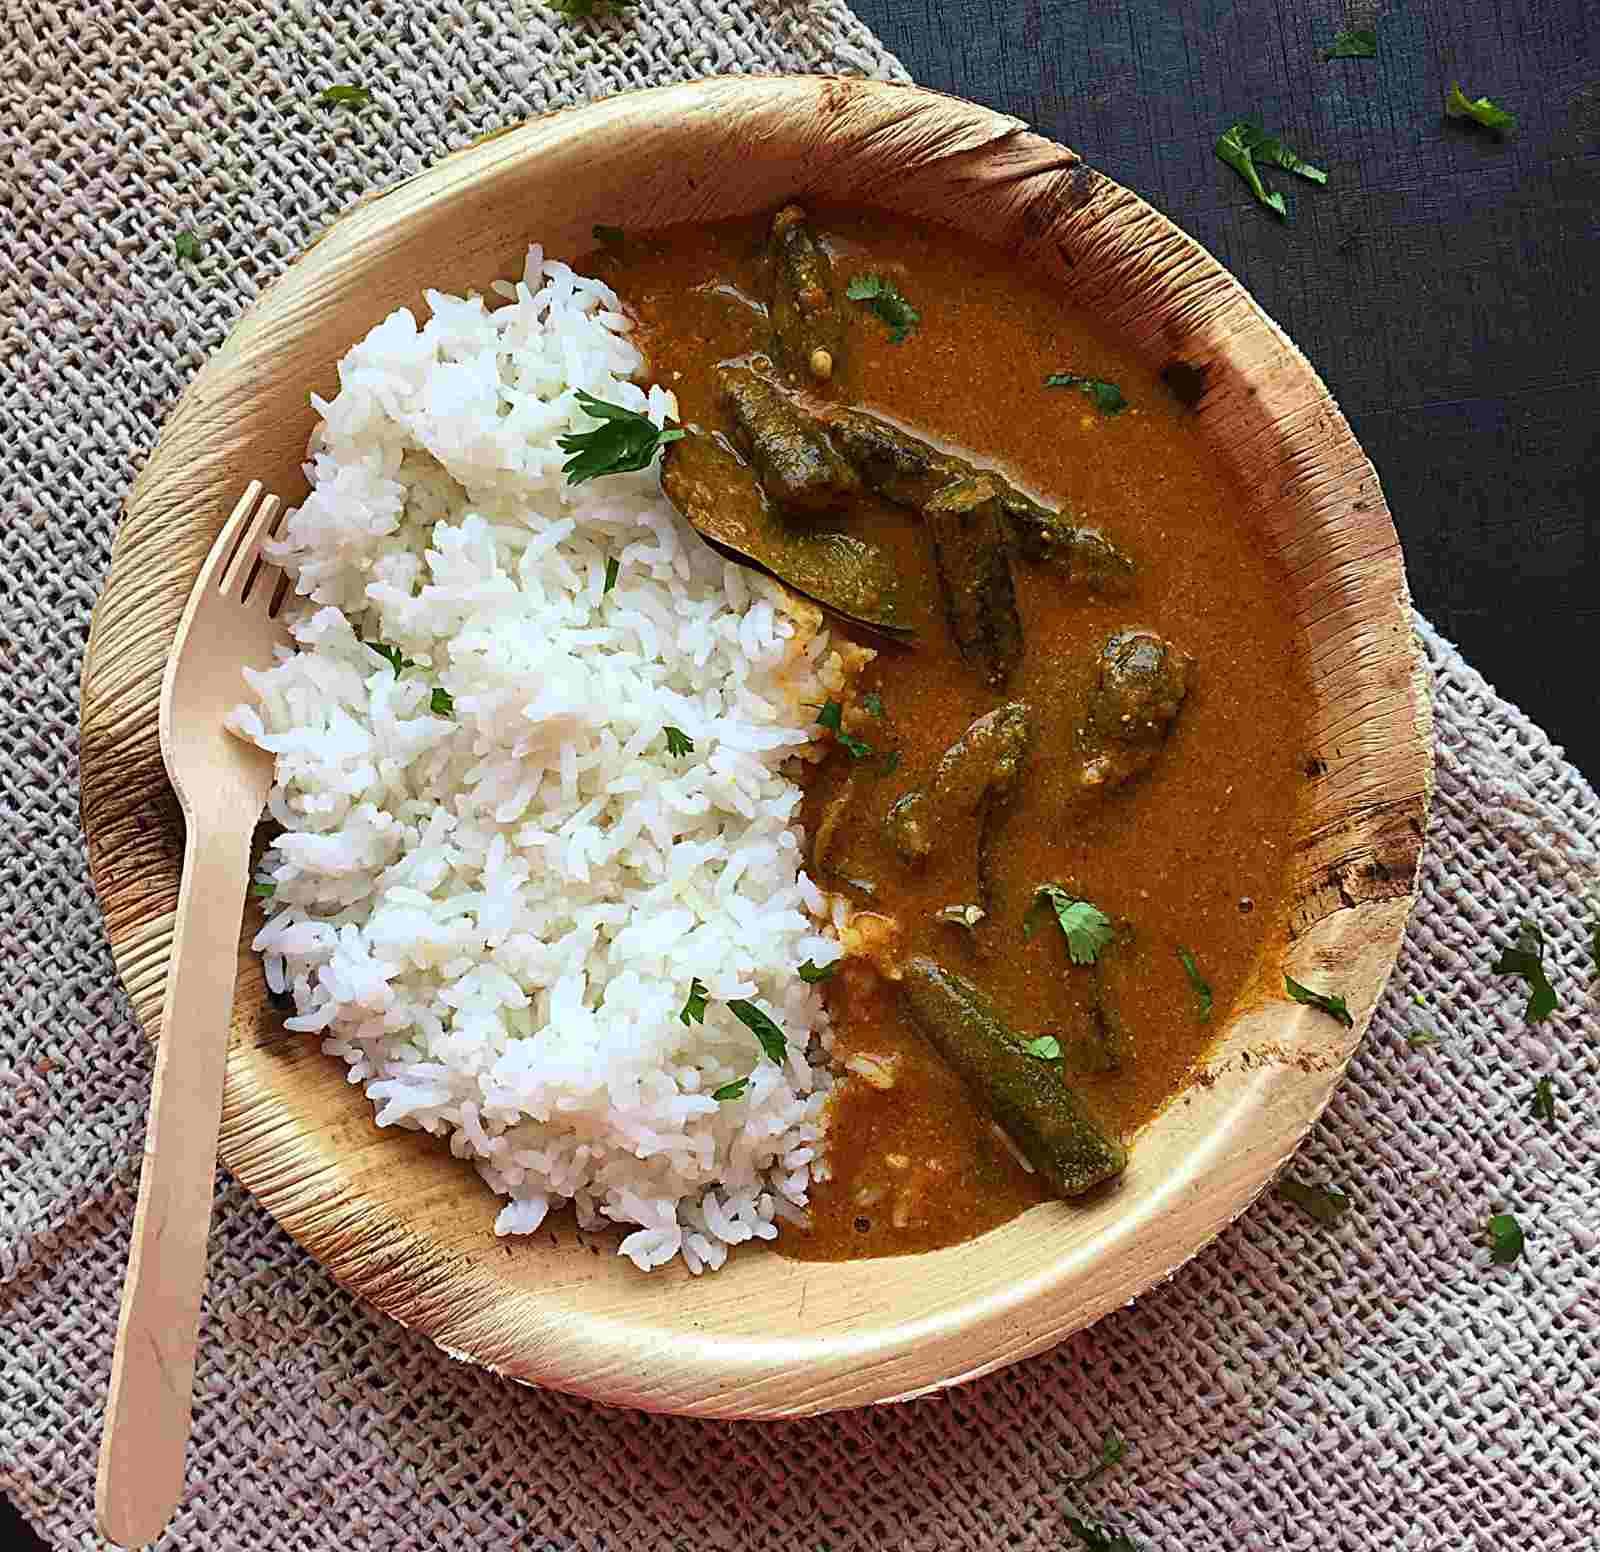 Bengali bhindi doi posto recipe by archanas kitchen bengali bhindi doi posto recipe forumfinder Image collections